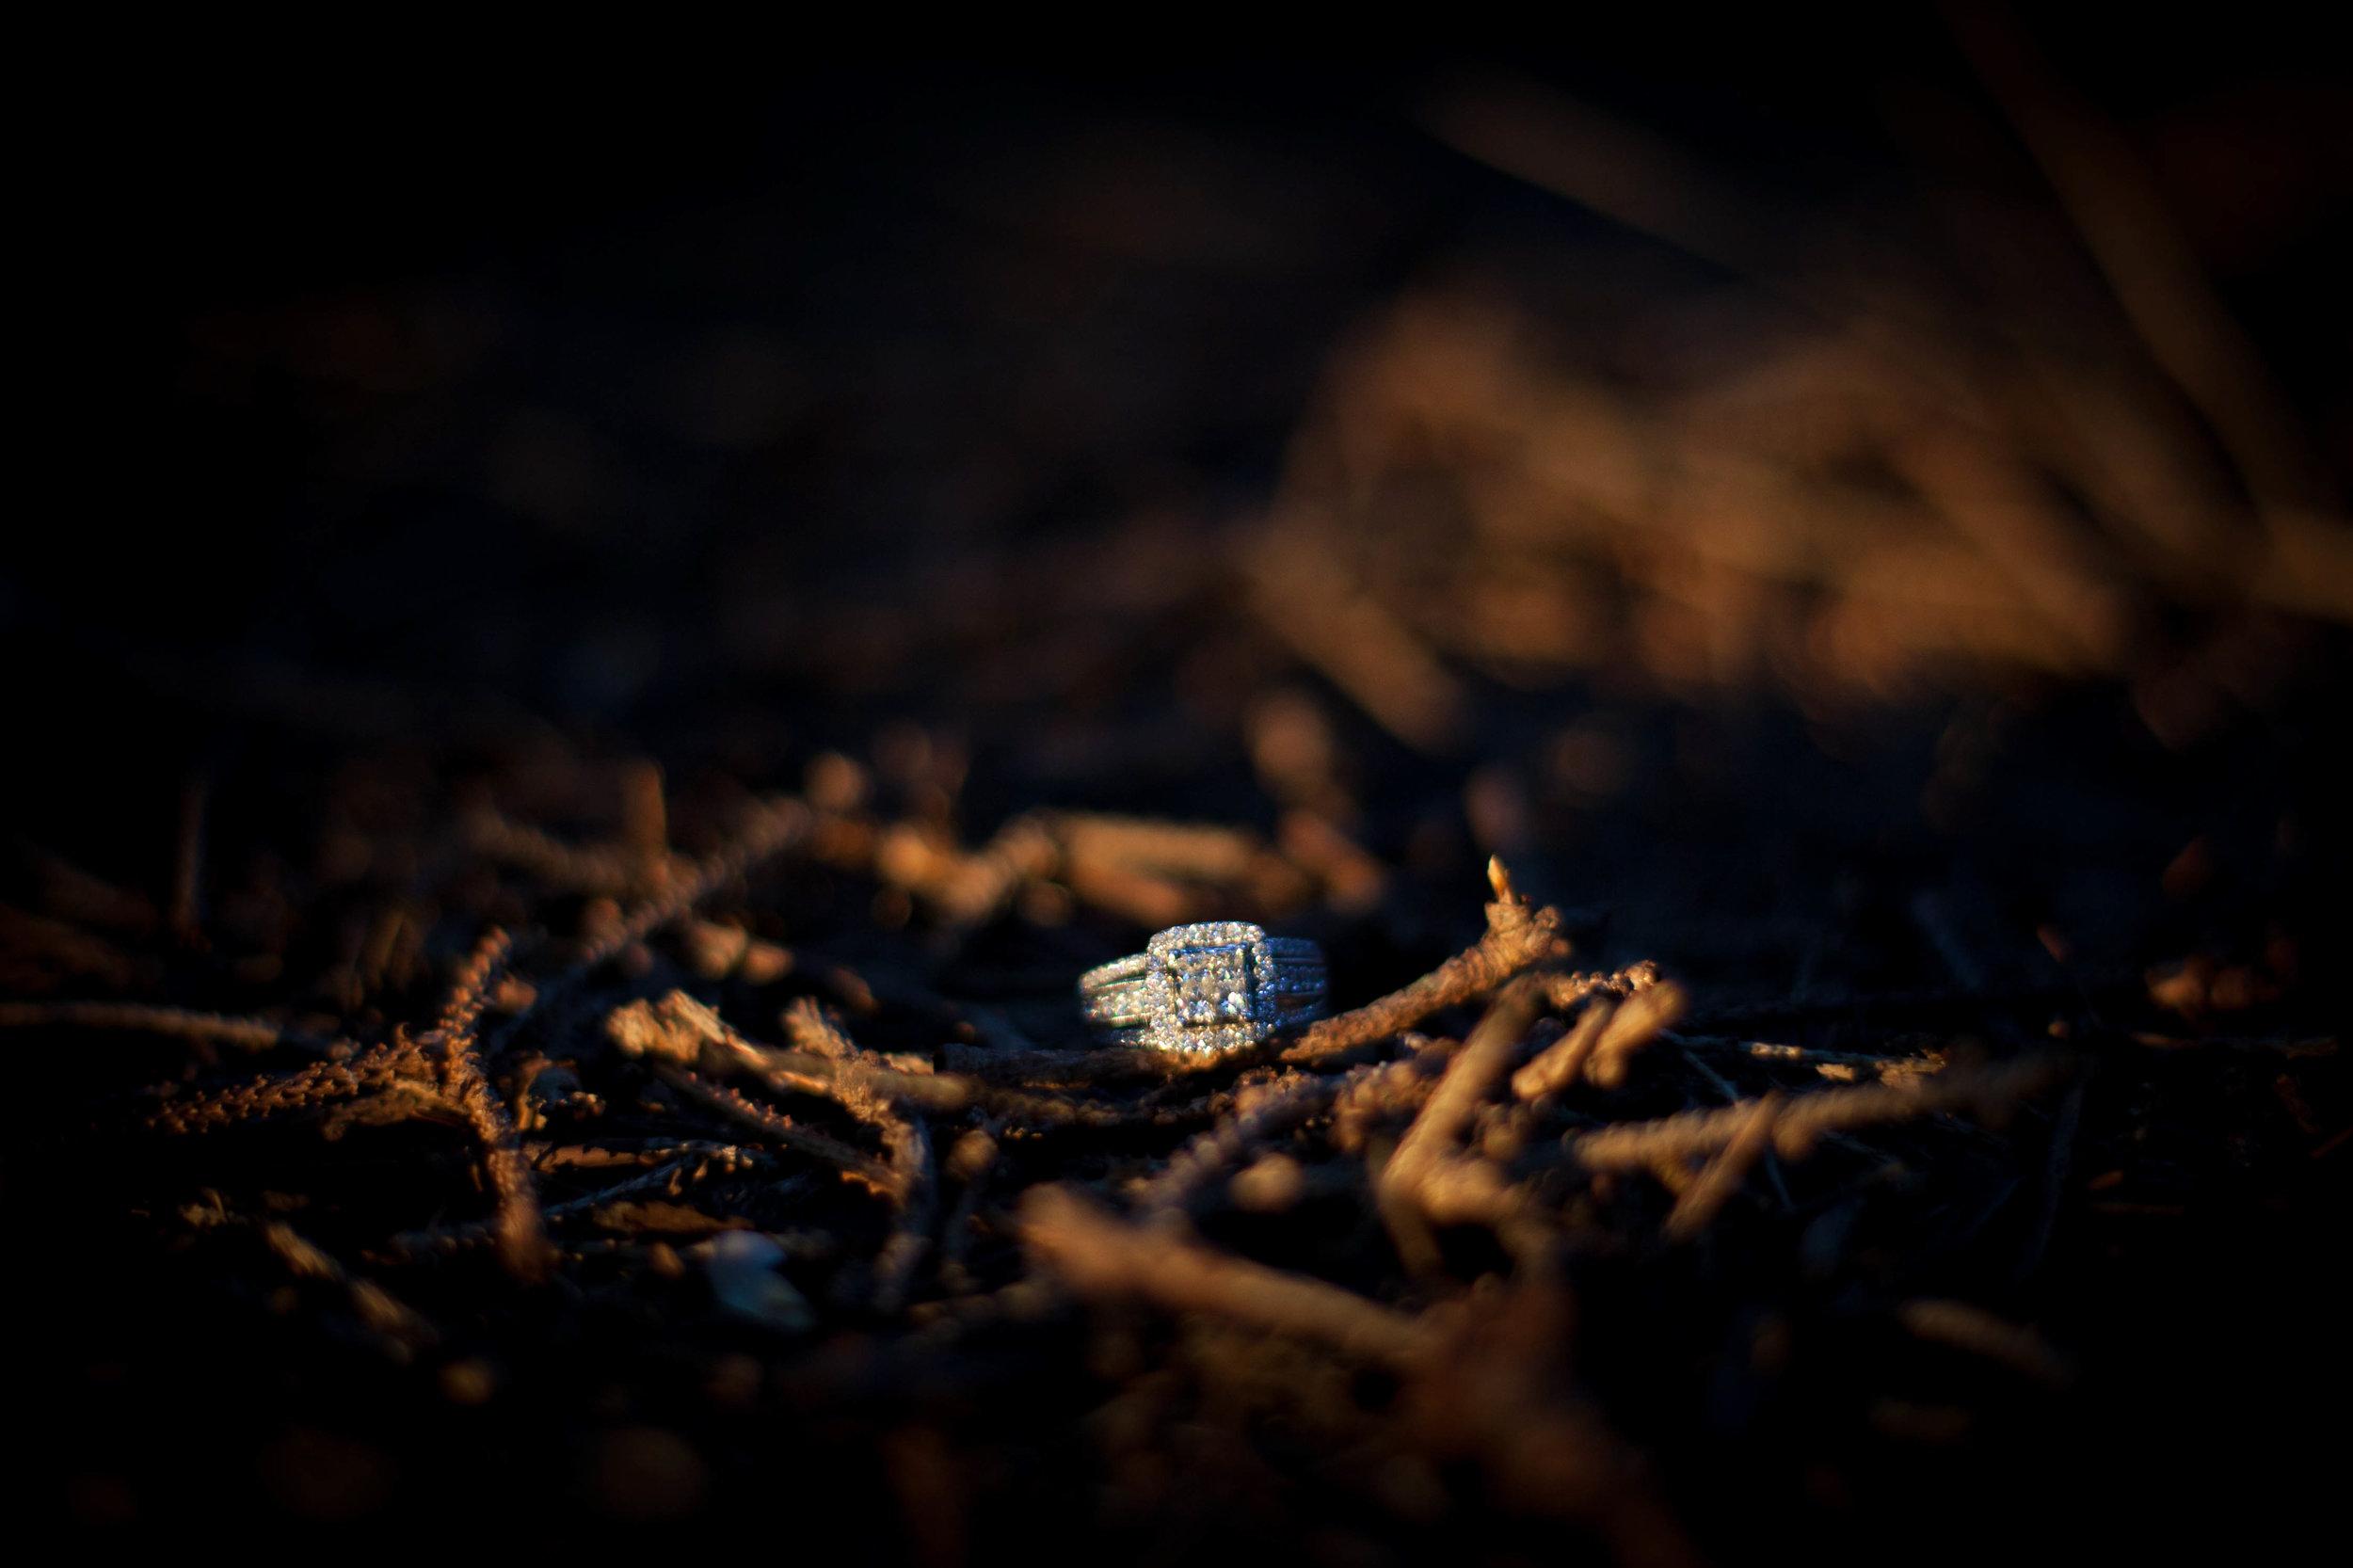 minnesota proposal engagement © kelilina photography 20170715151945.jpg